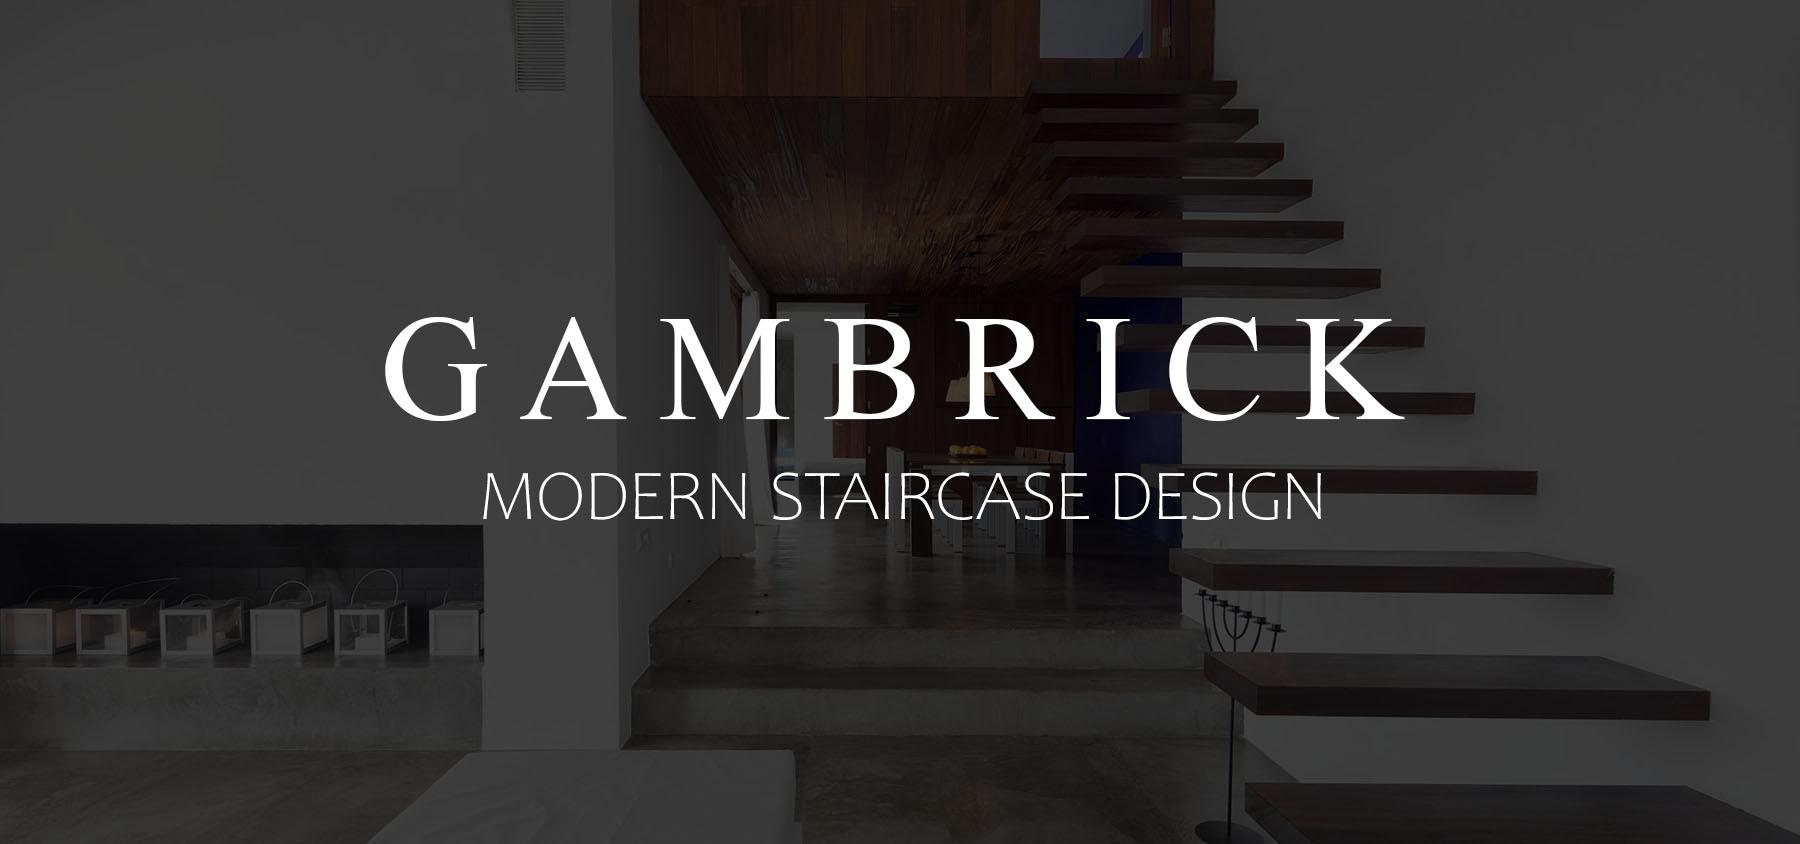 modern staircase design banner pic